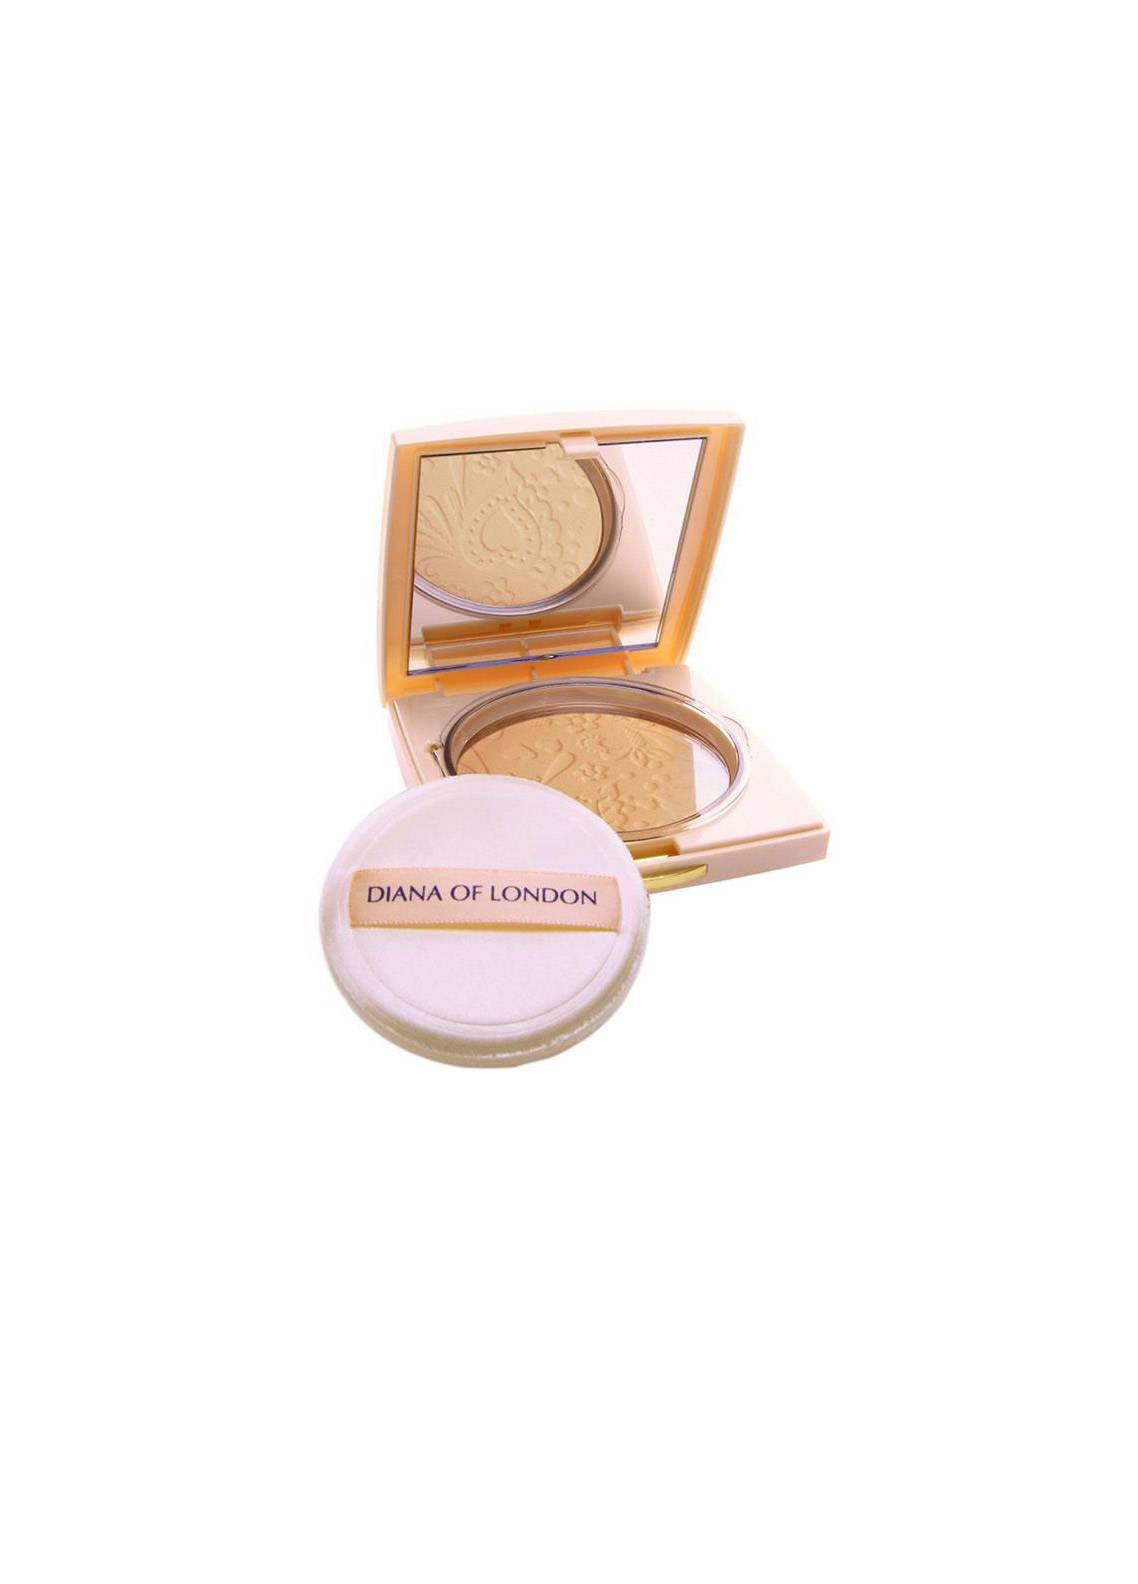 Diana Of London Absolute Compact Powder - Tender Peach-405